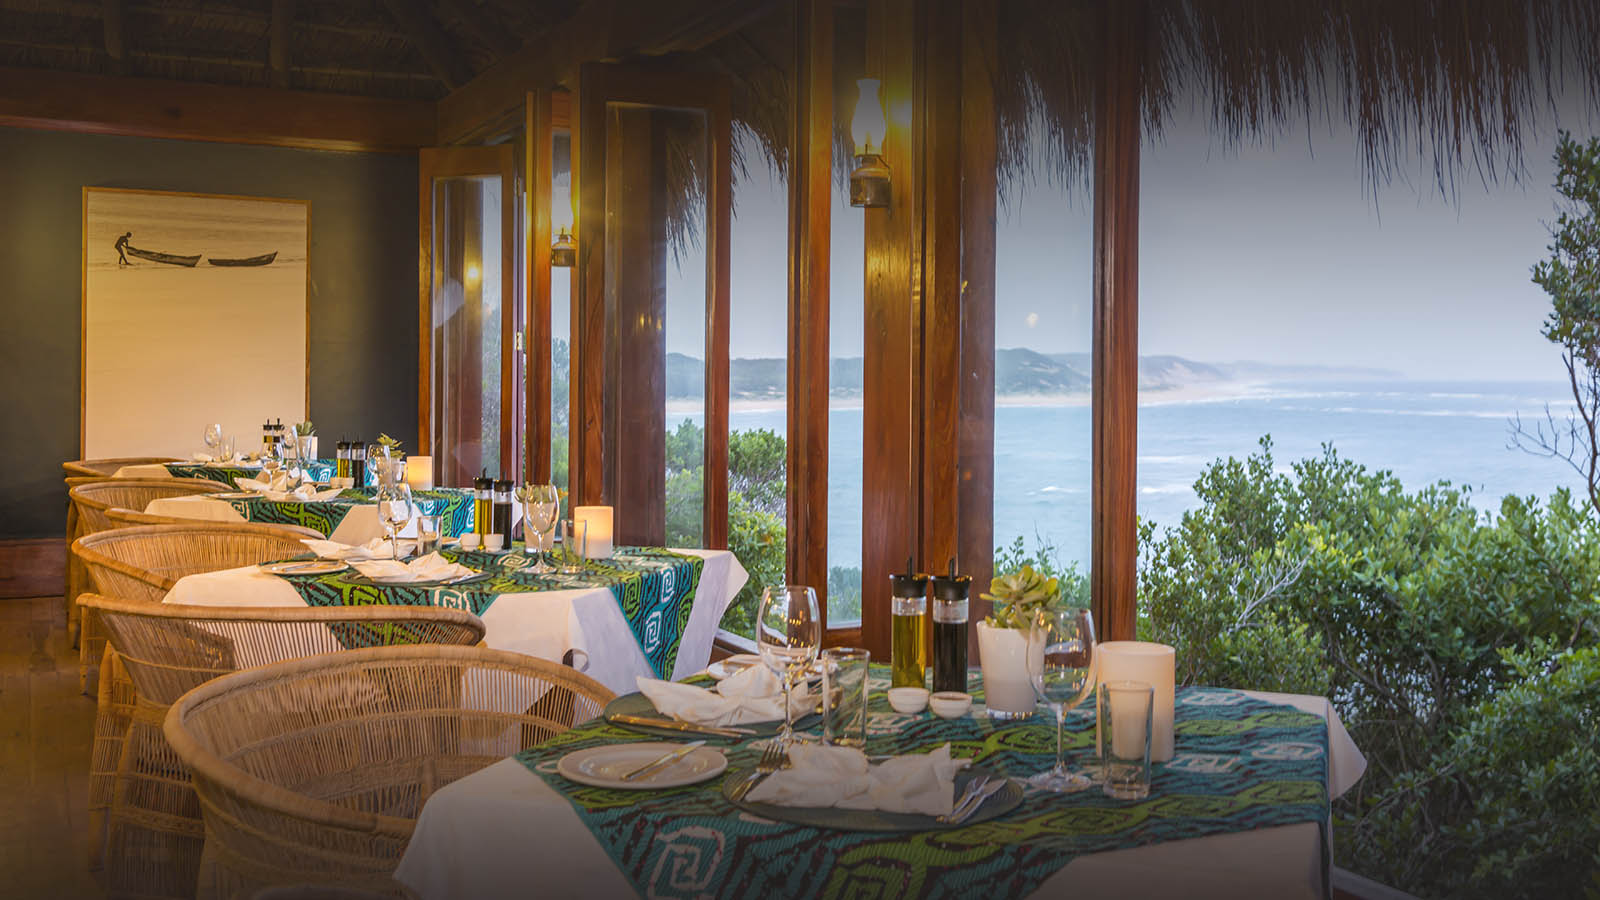 machangulo beach lodge mozambique-lodges-zambia-in-style-maputo-luxury-island-tours-dinner